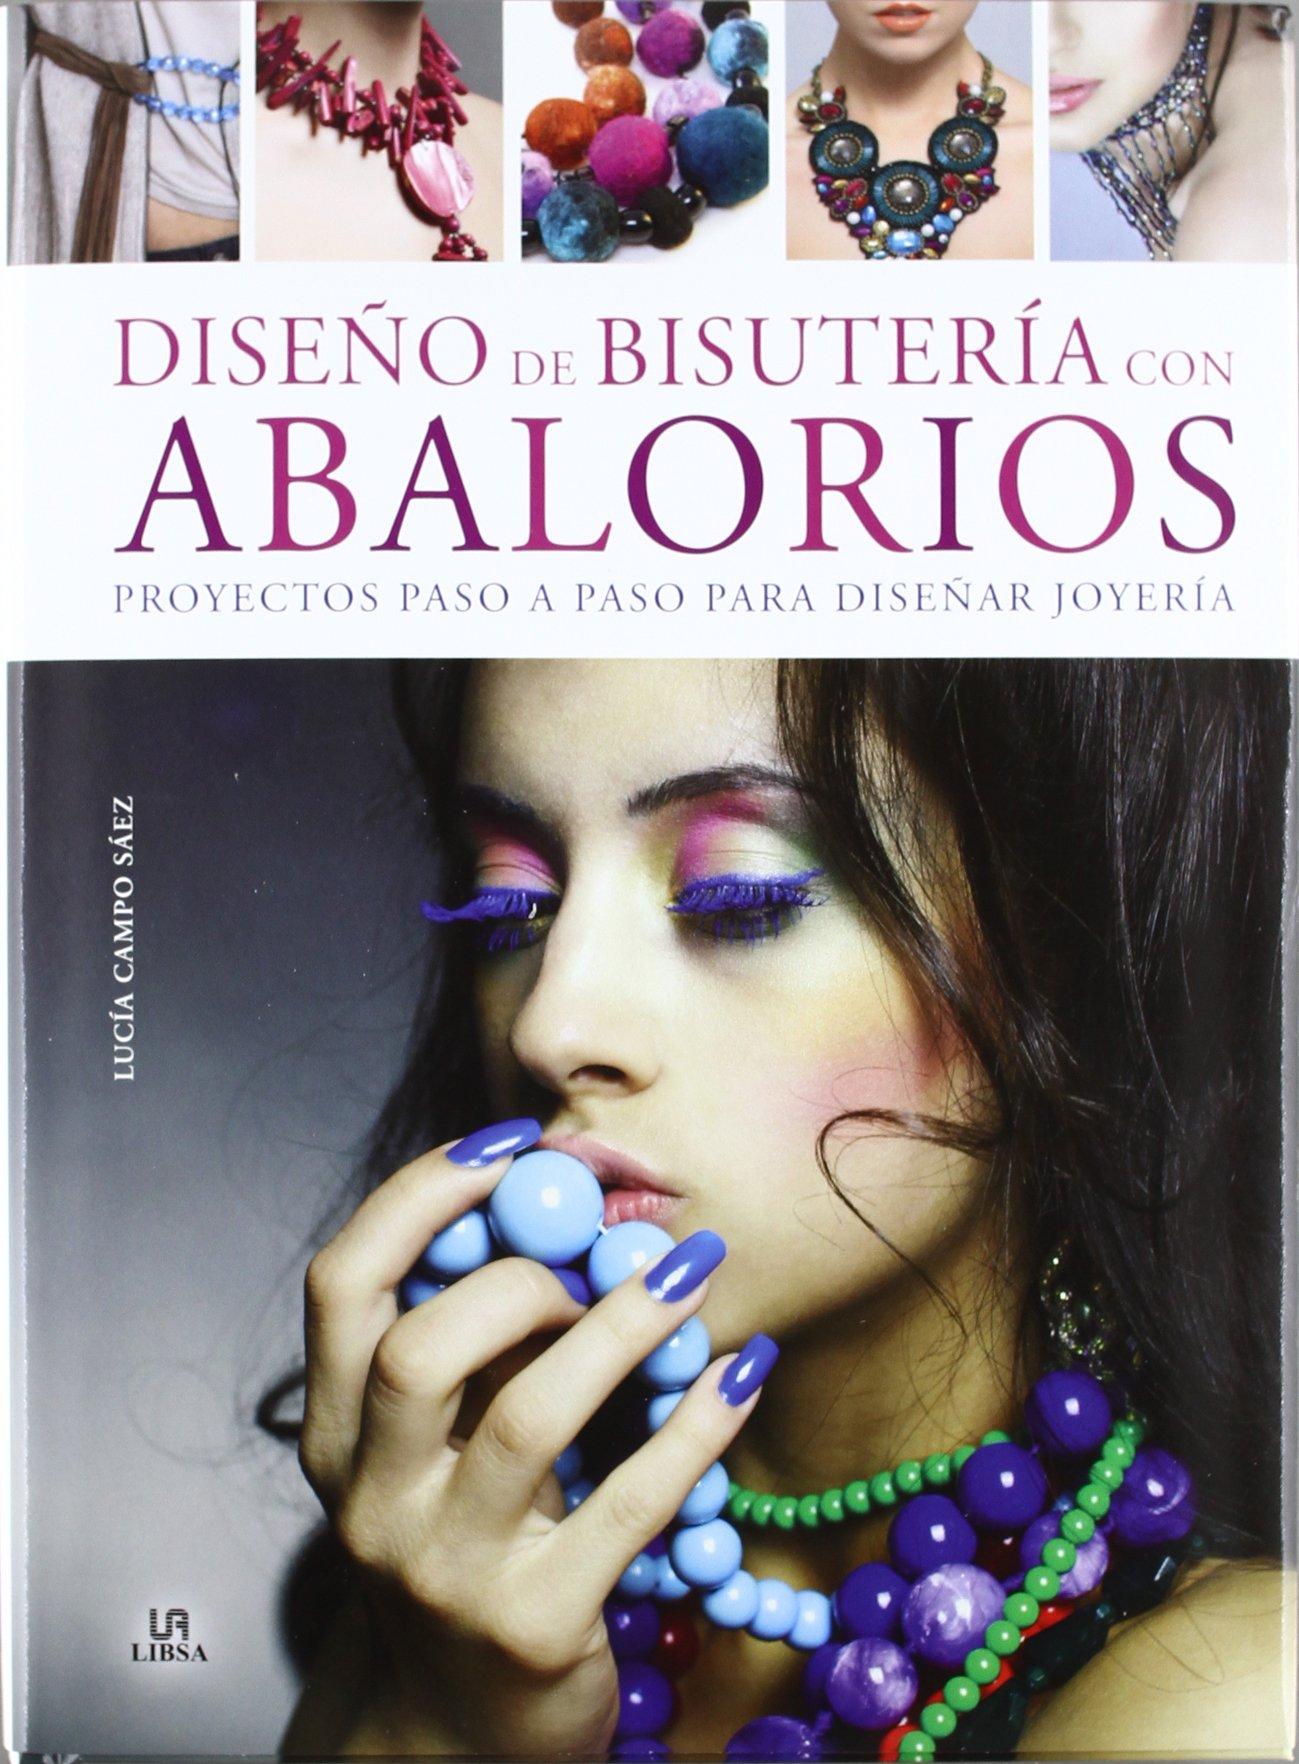 Read Online Disenos de bisuteria con abalorios / Beaded jewelry designs: Proyectos paso a paso para disenar joyeria / Step by Step Projects to Design Jewelry (Spanish Edition) pdf epub